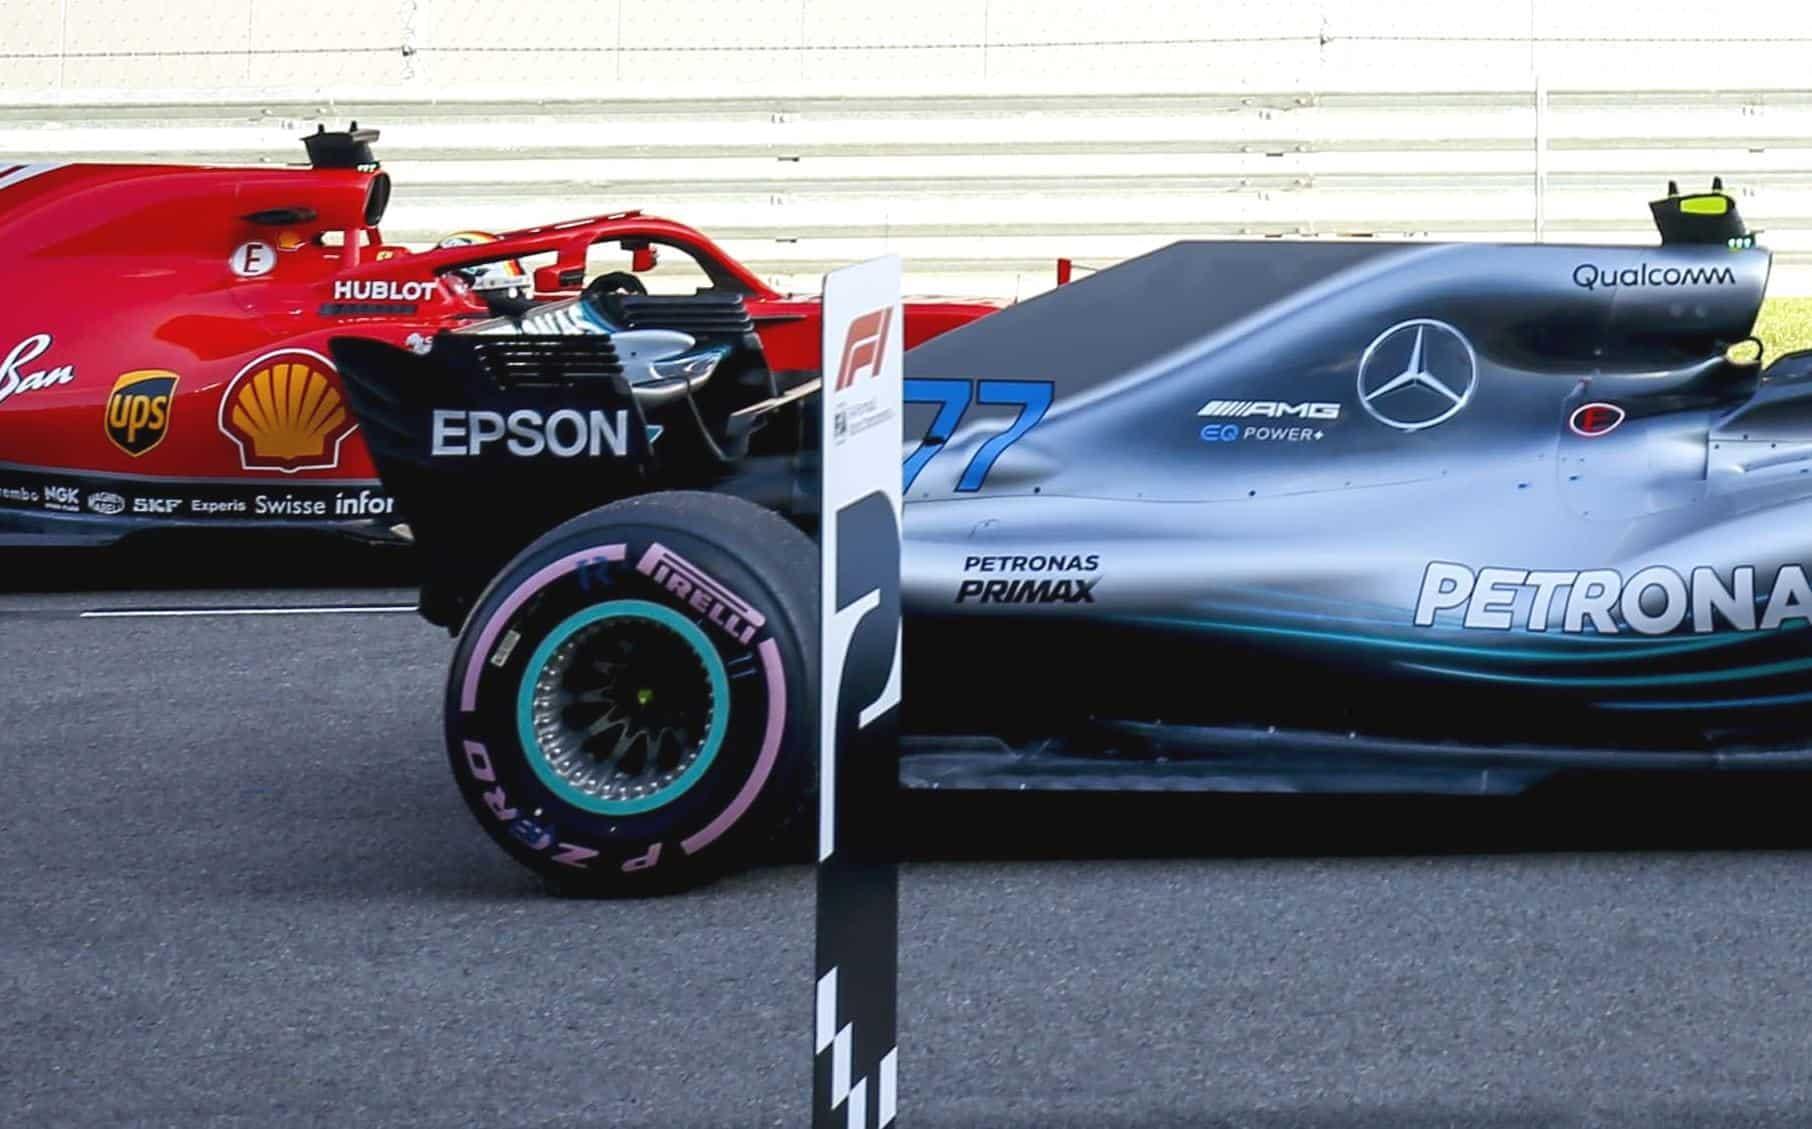 Mercedes W09 rear wheels heat sink Russian GP F1 2018 Photo Daimler edited by MAXF1net